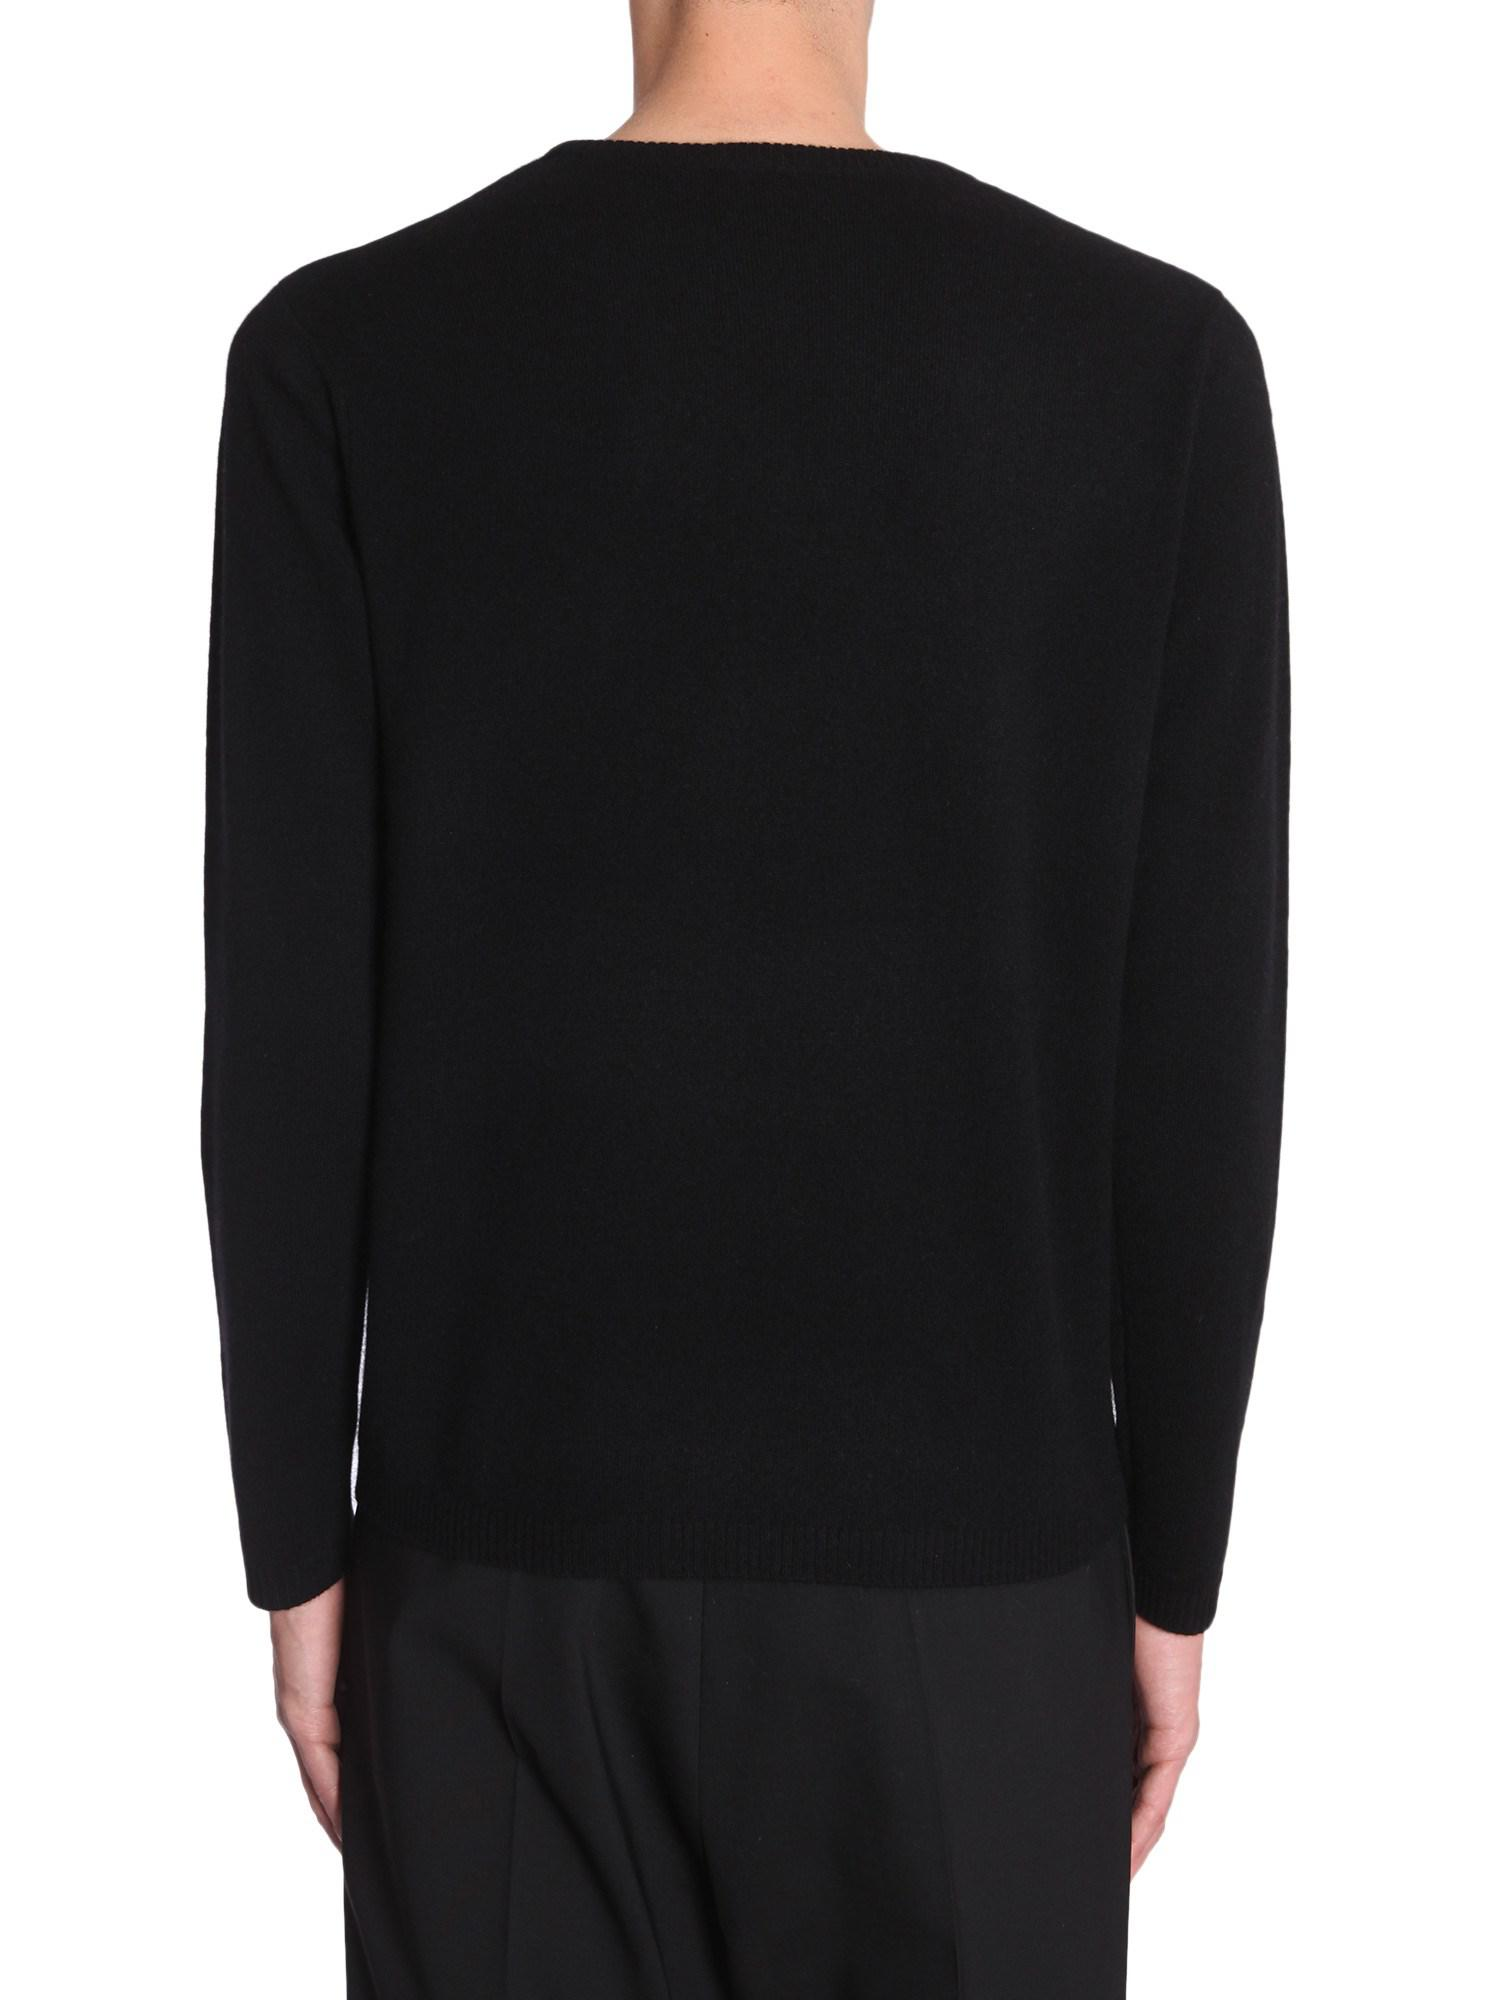 Bella Freud Dog Intarsia Cashmere Sweater in Black for Men